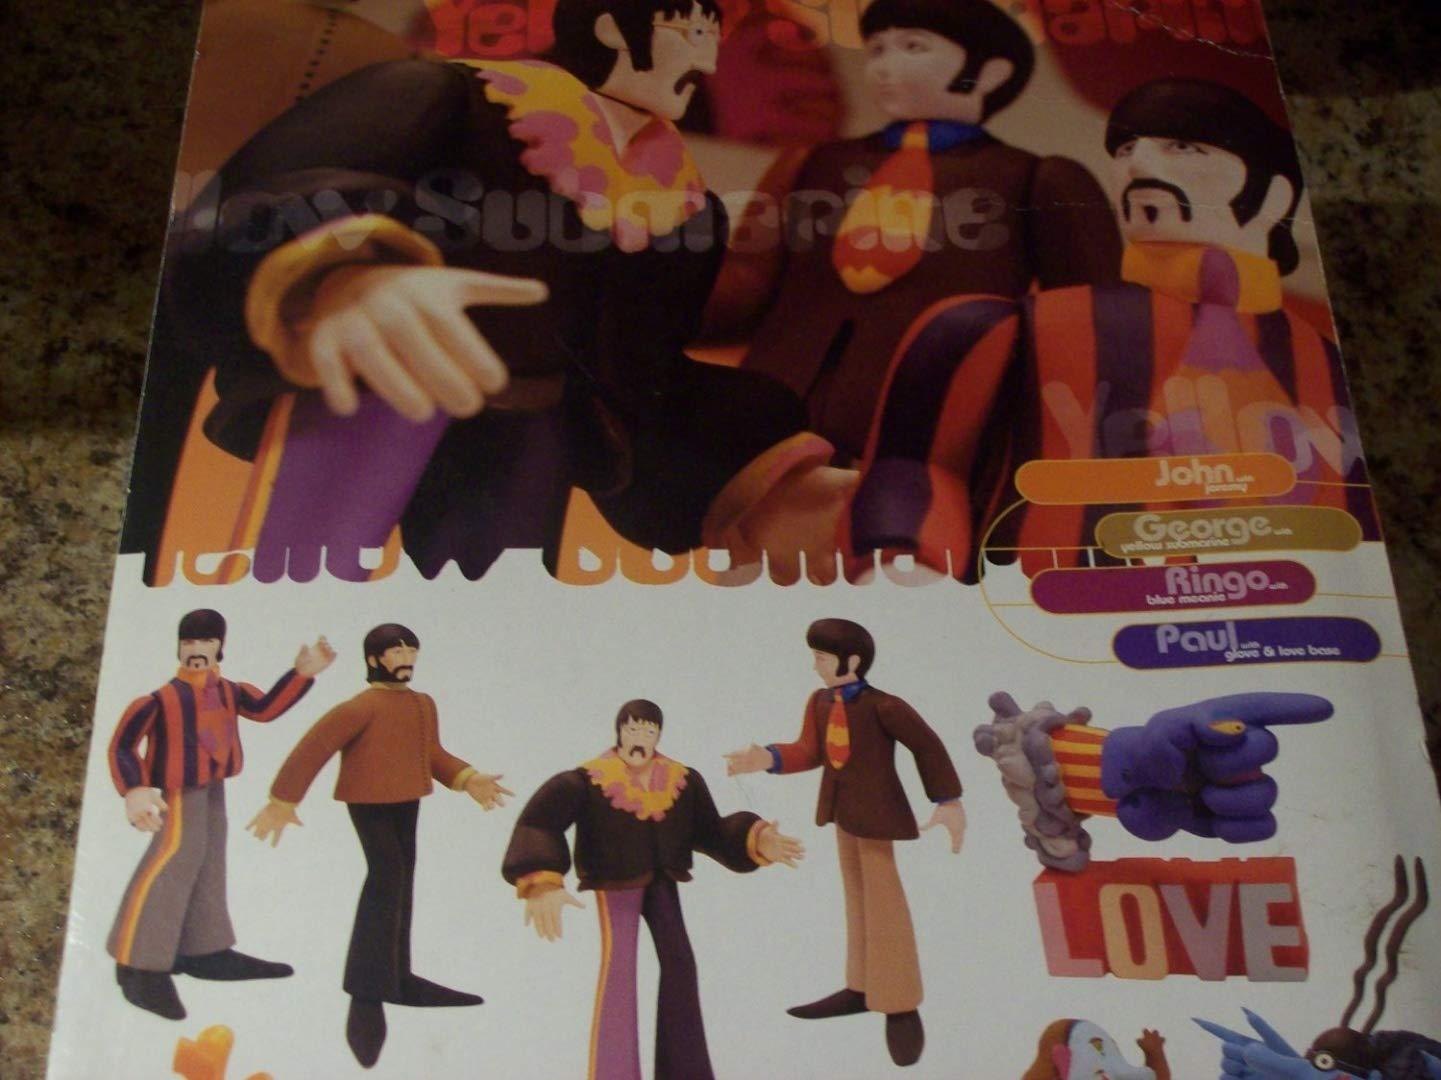 El Submarino Amarillo de The Beatles George Harrison Harrison Harrison figura de accioacute;n con submarino amarillo juguete por McFarlane Toys 797cd3